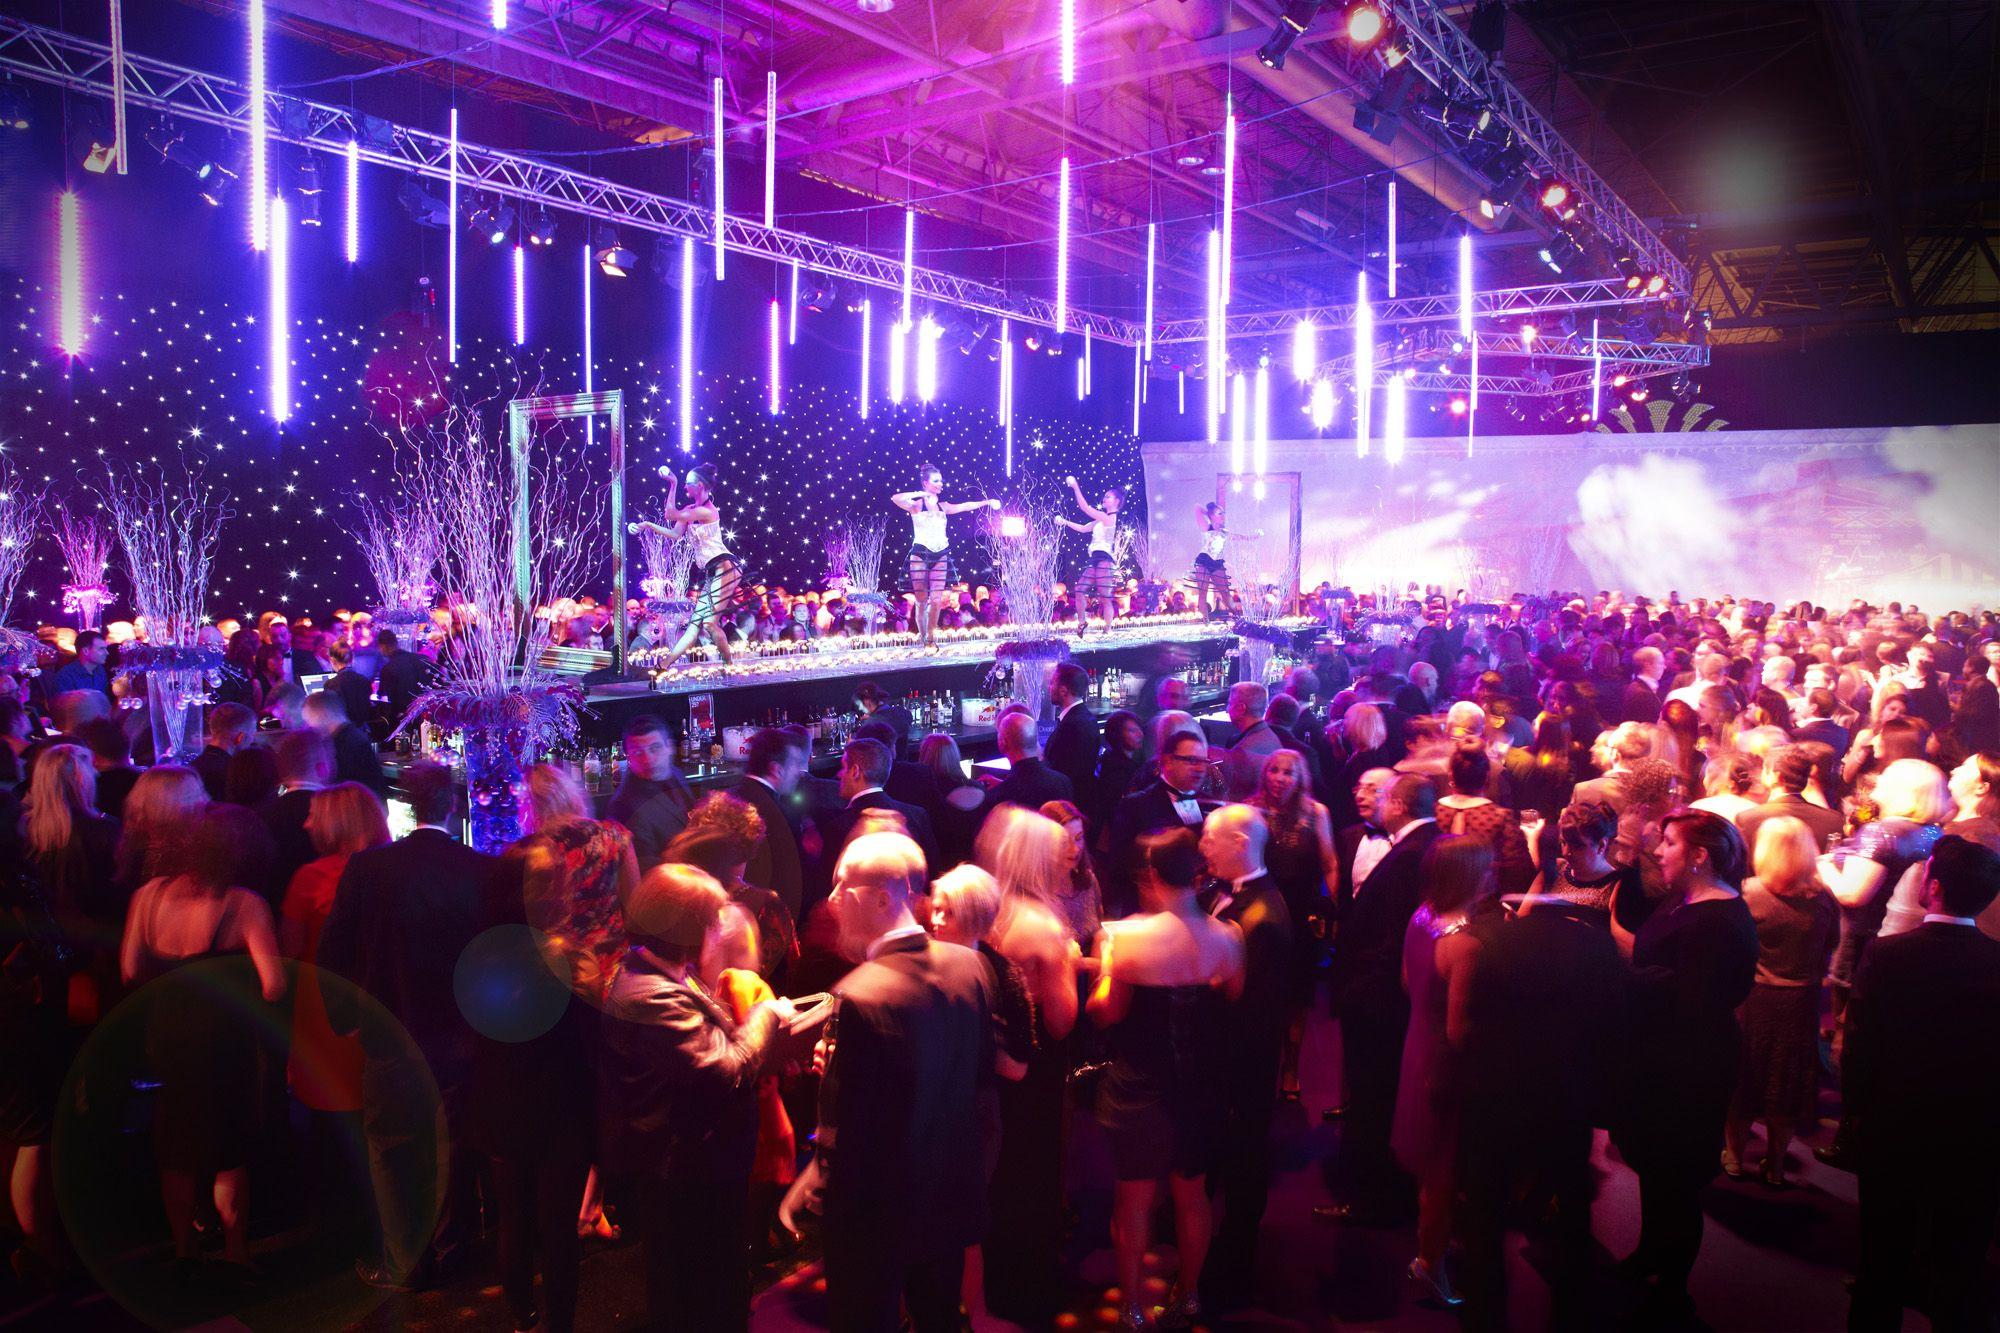 Christmas Party Birmingham Part - 18: Bar Entertainment At Christmas Party World 2013 At The NEC, Birmingham.  (Photo Credit